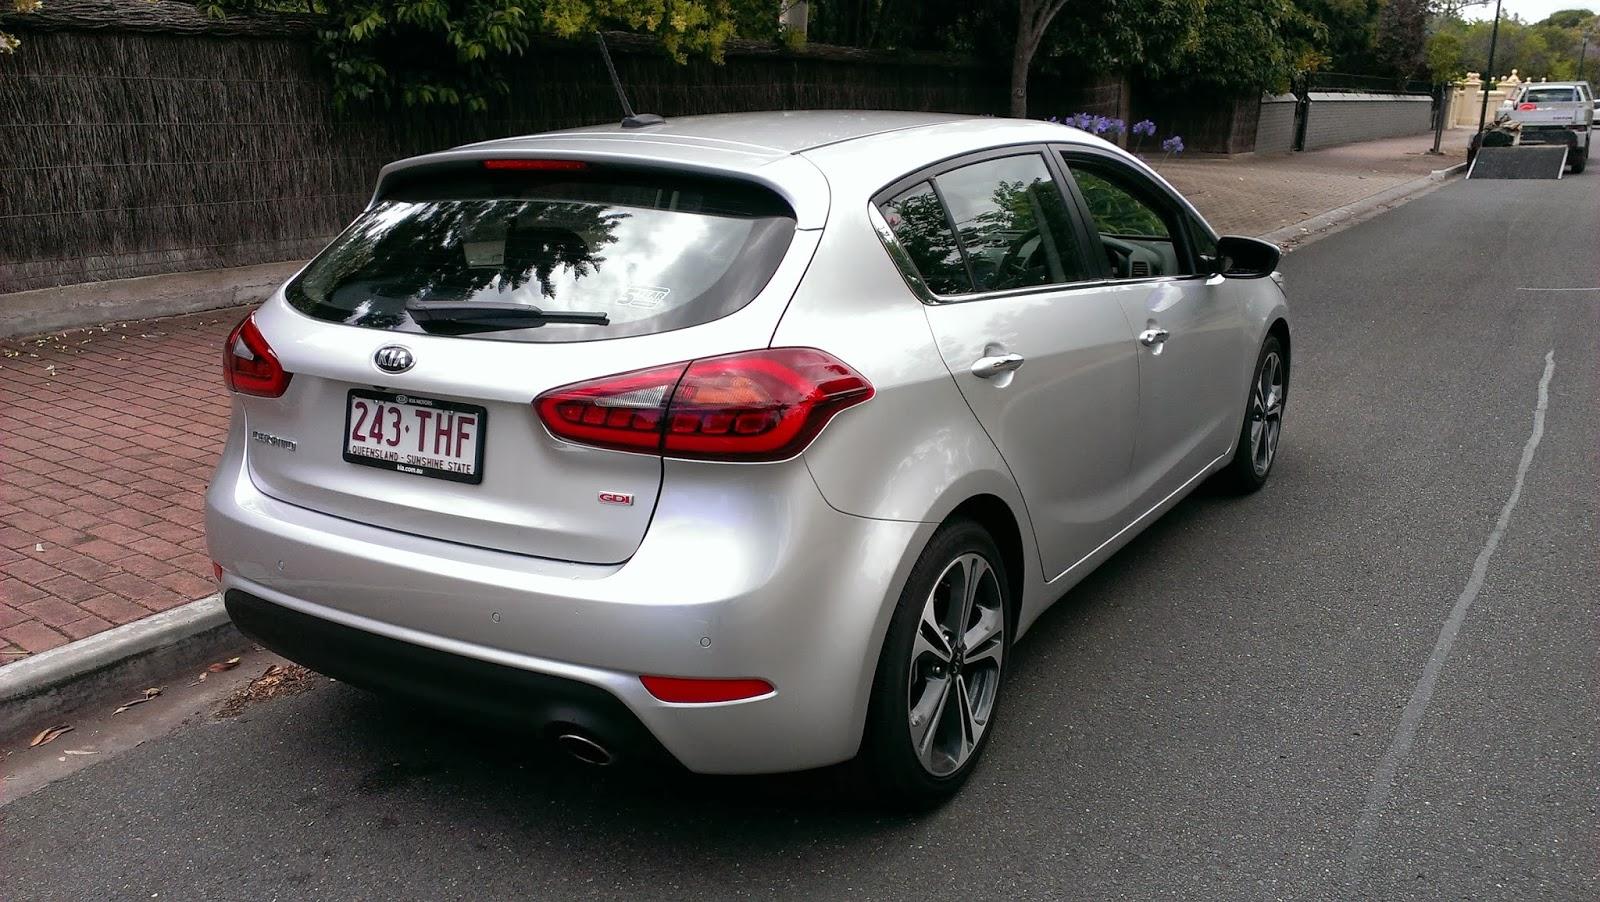 Kia Forte 2014 South Africa Price | Autos Weblog